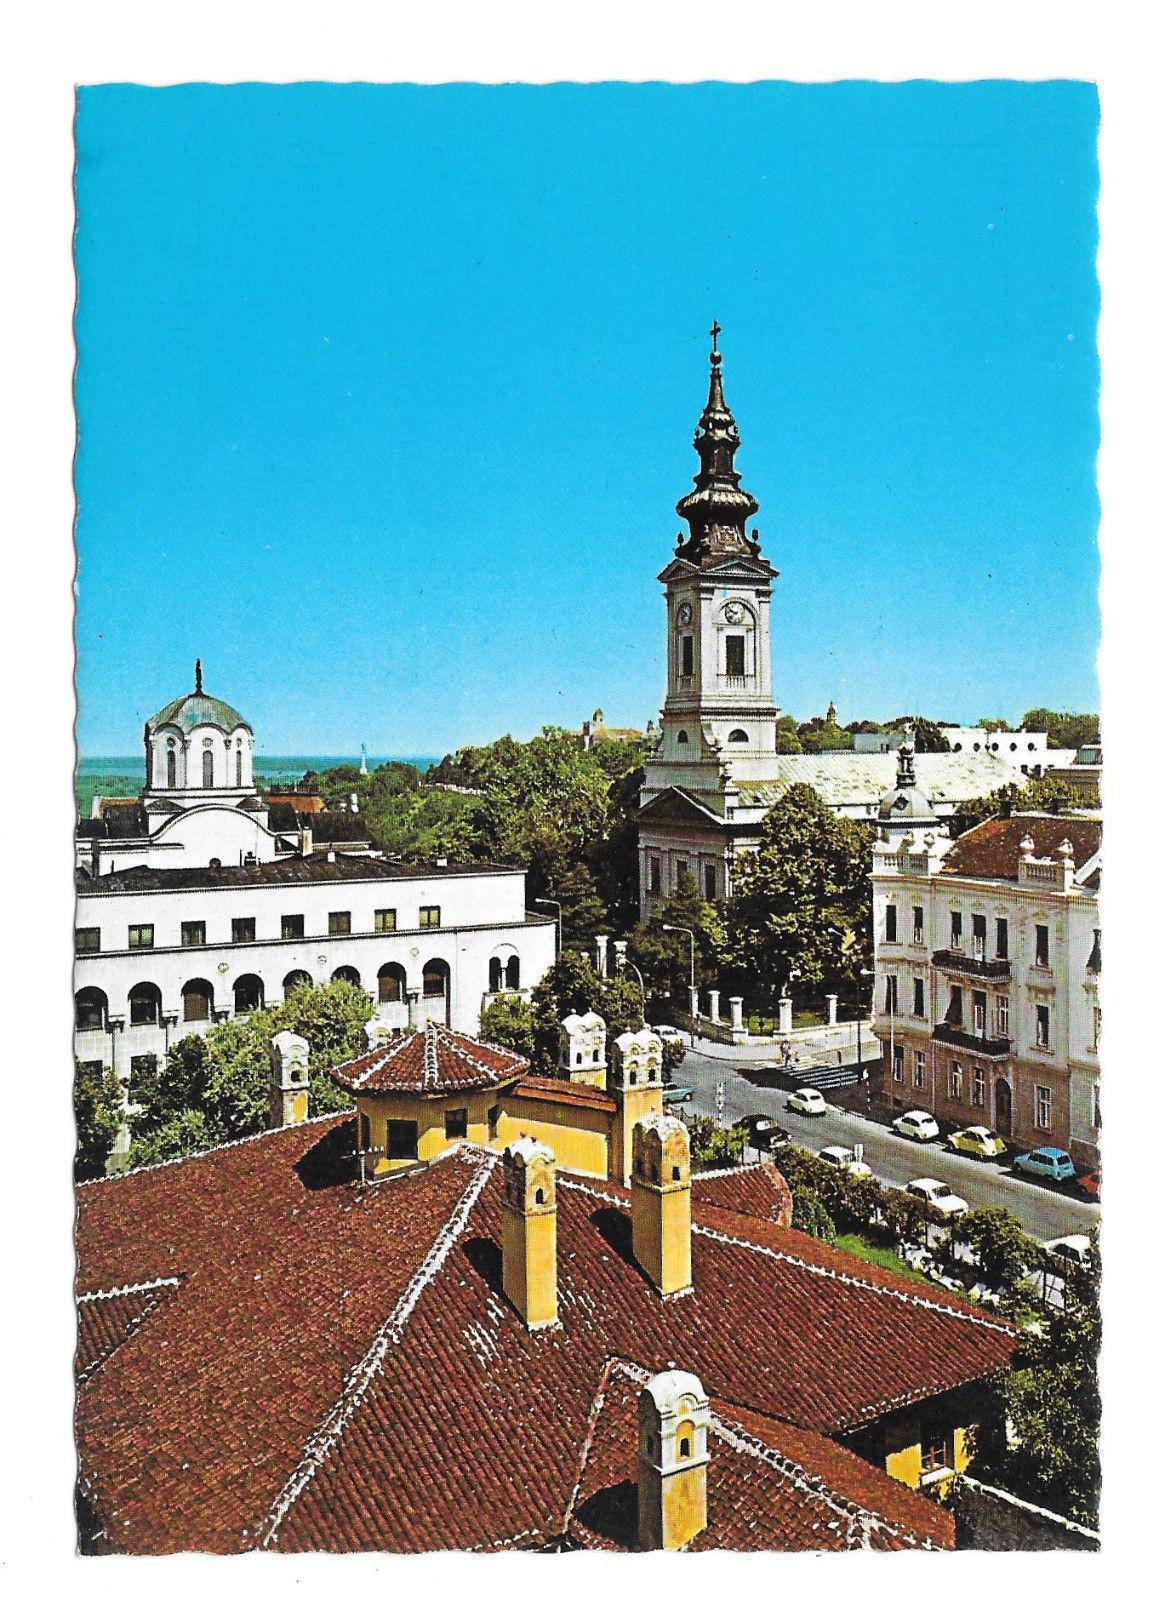 Serbia Belgrade Cathedral Orthodox Patriarchate Vtg Postcard 4X6